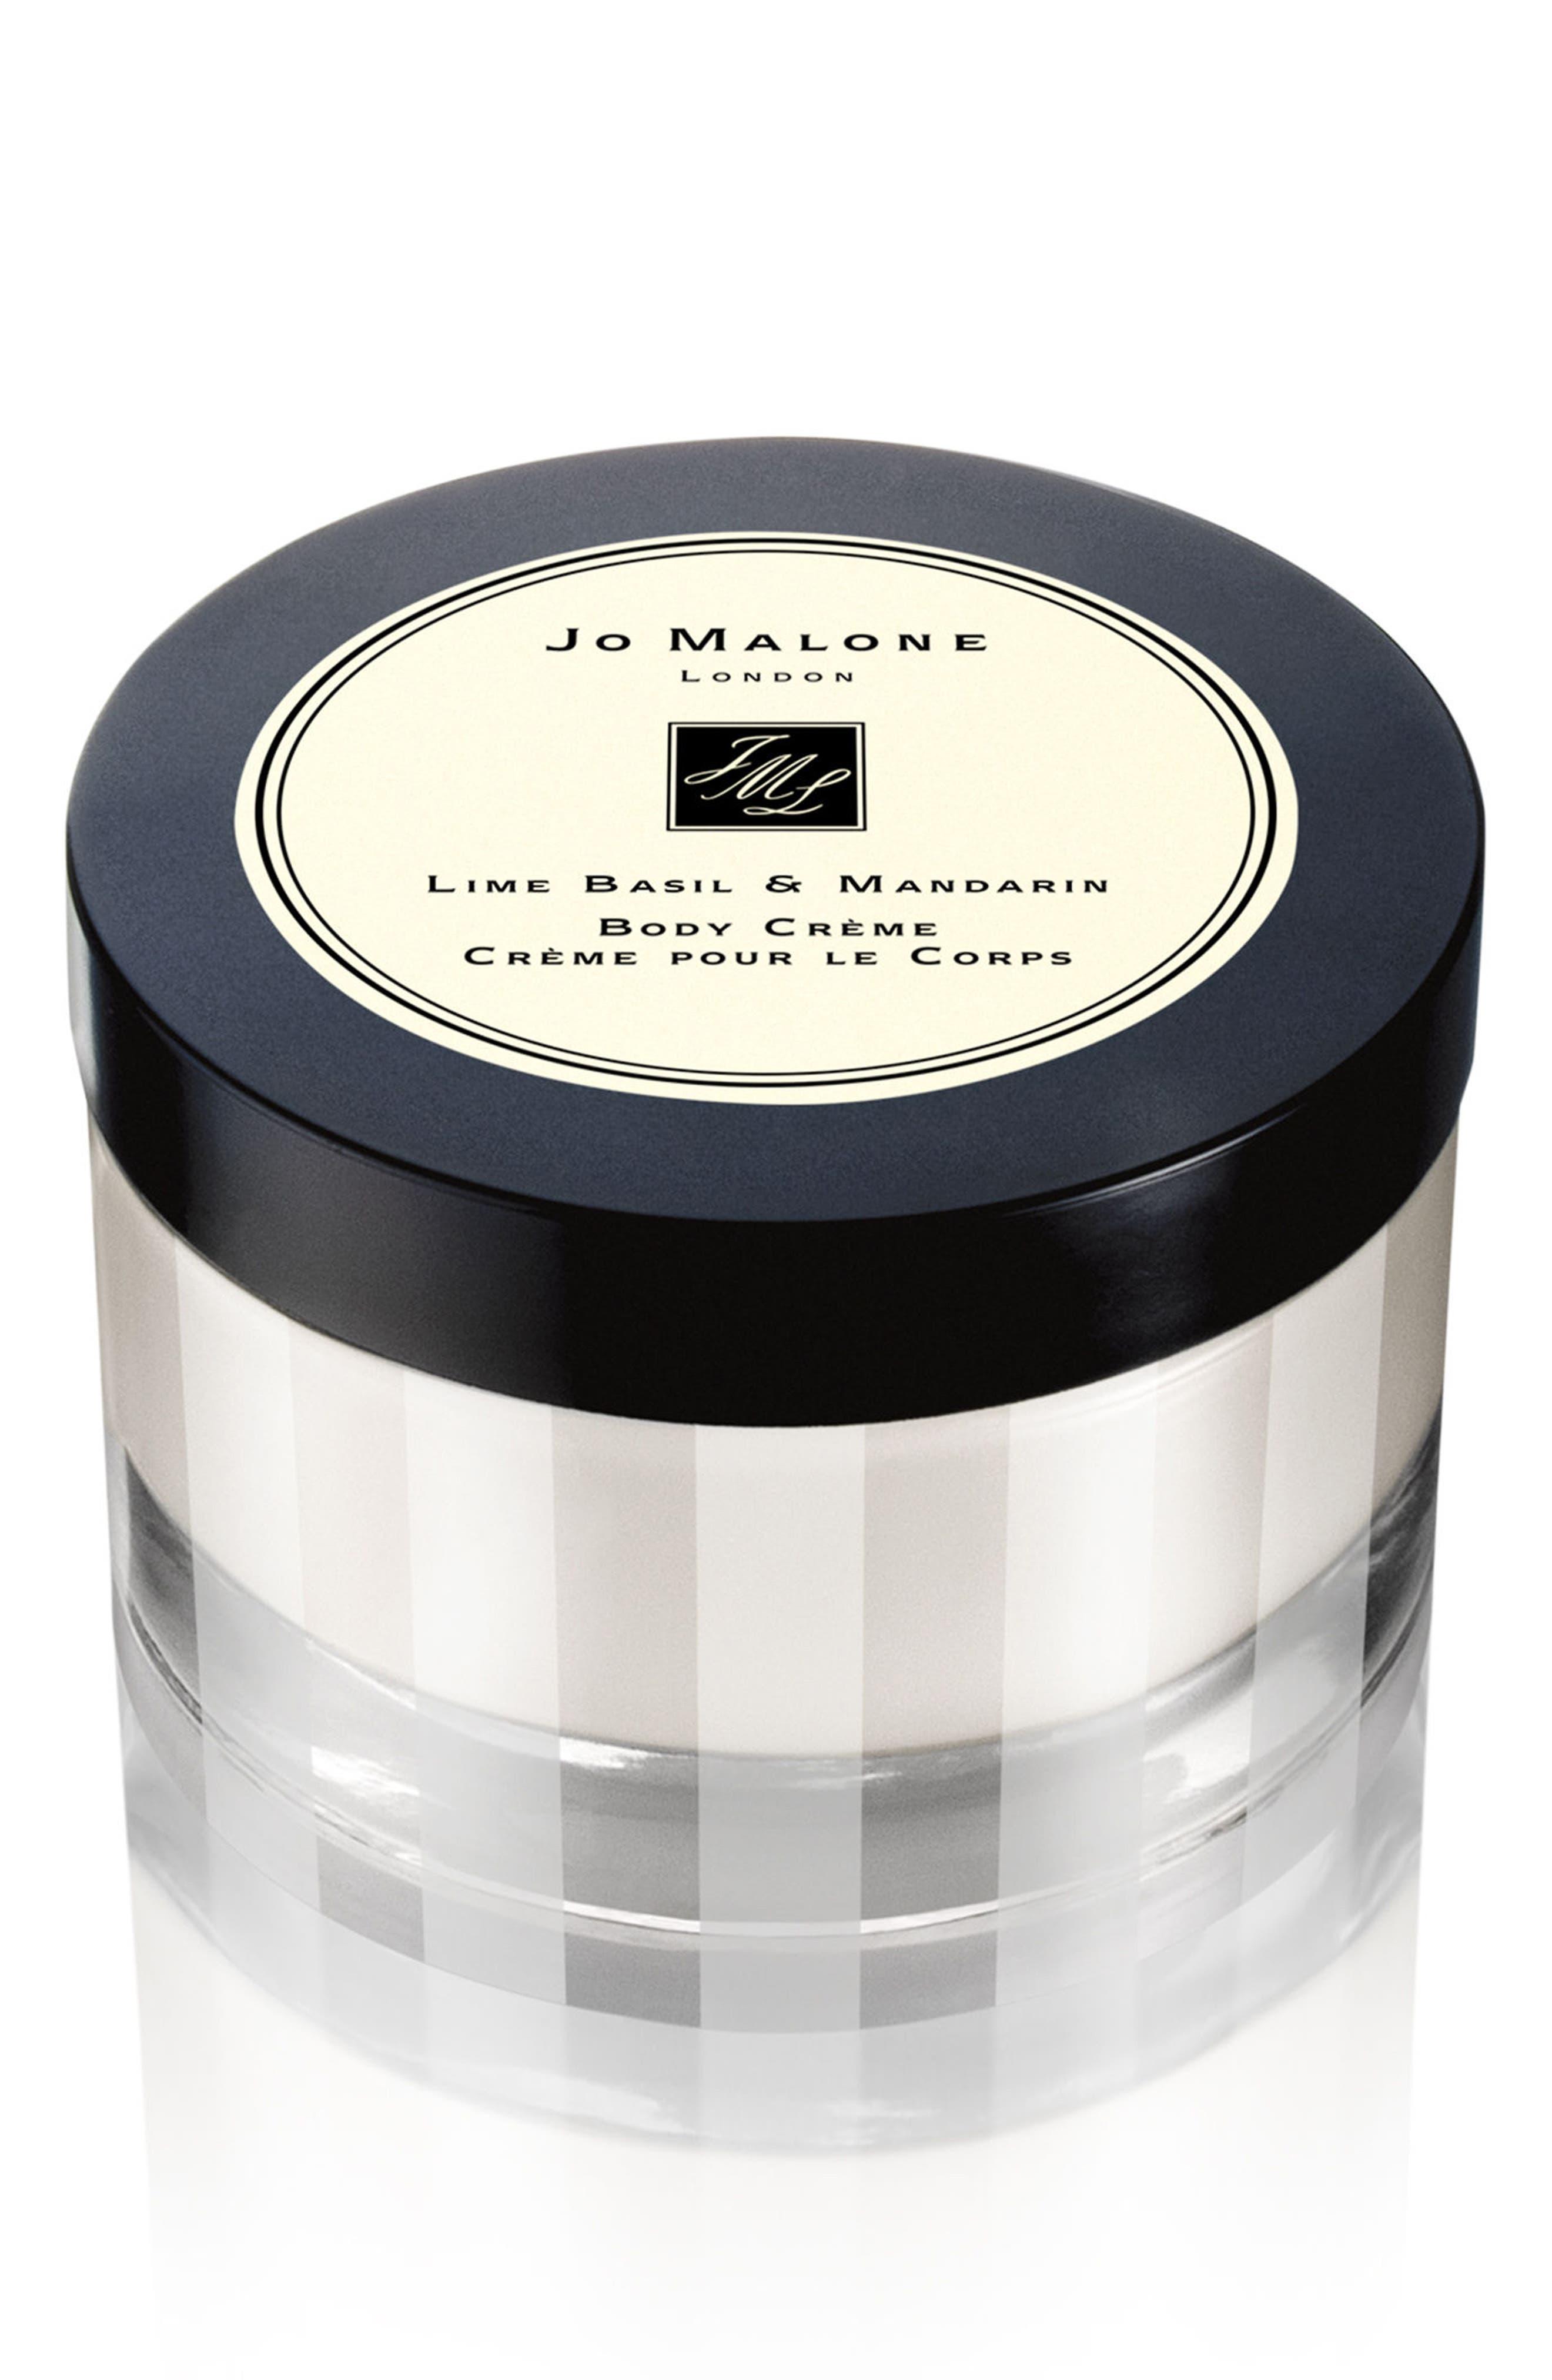 Alternate Image 1 Selected - Jo Malone London™ Lime Basil & Mandarin Body Crème